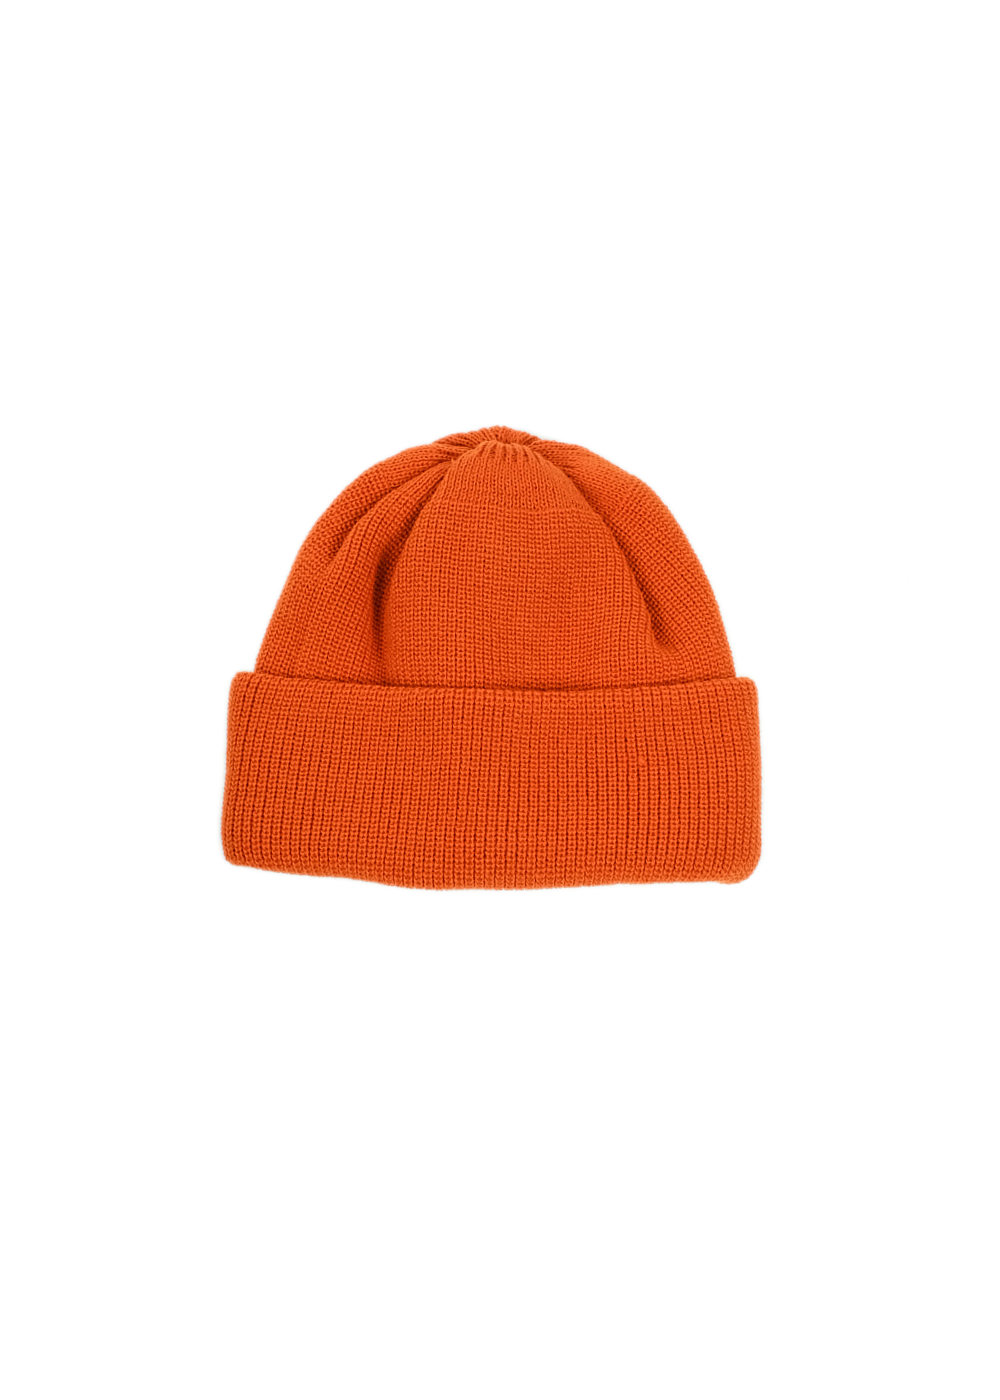 Rototo-Bulky-watch-Cap-Orange-01